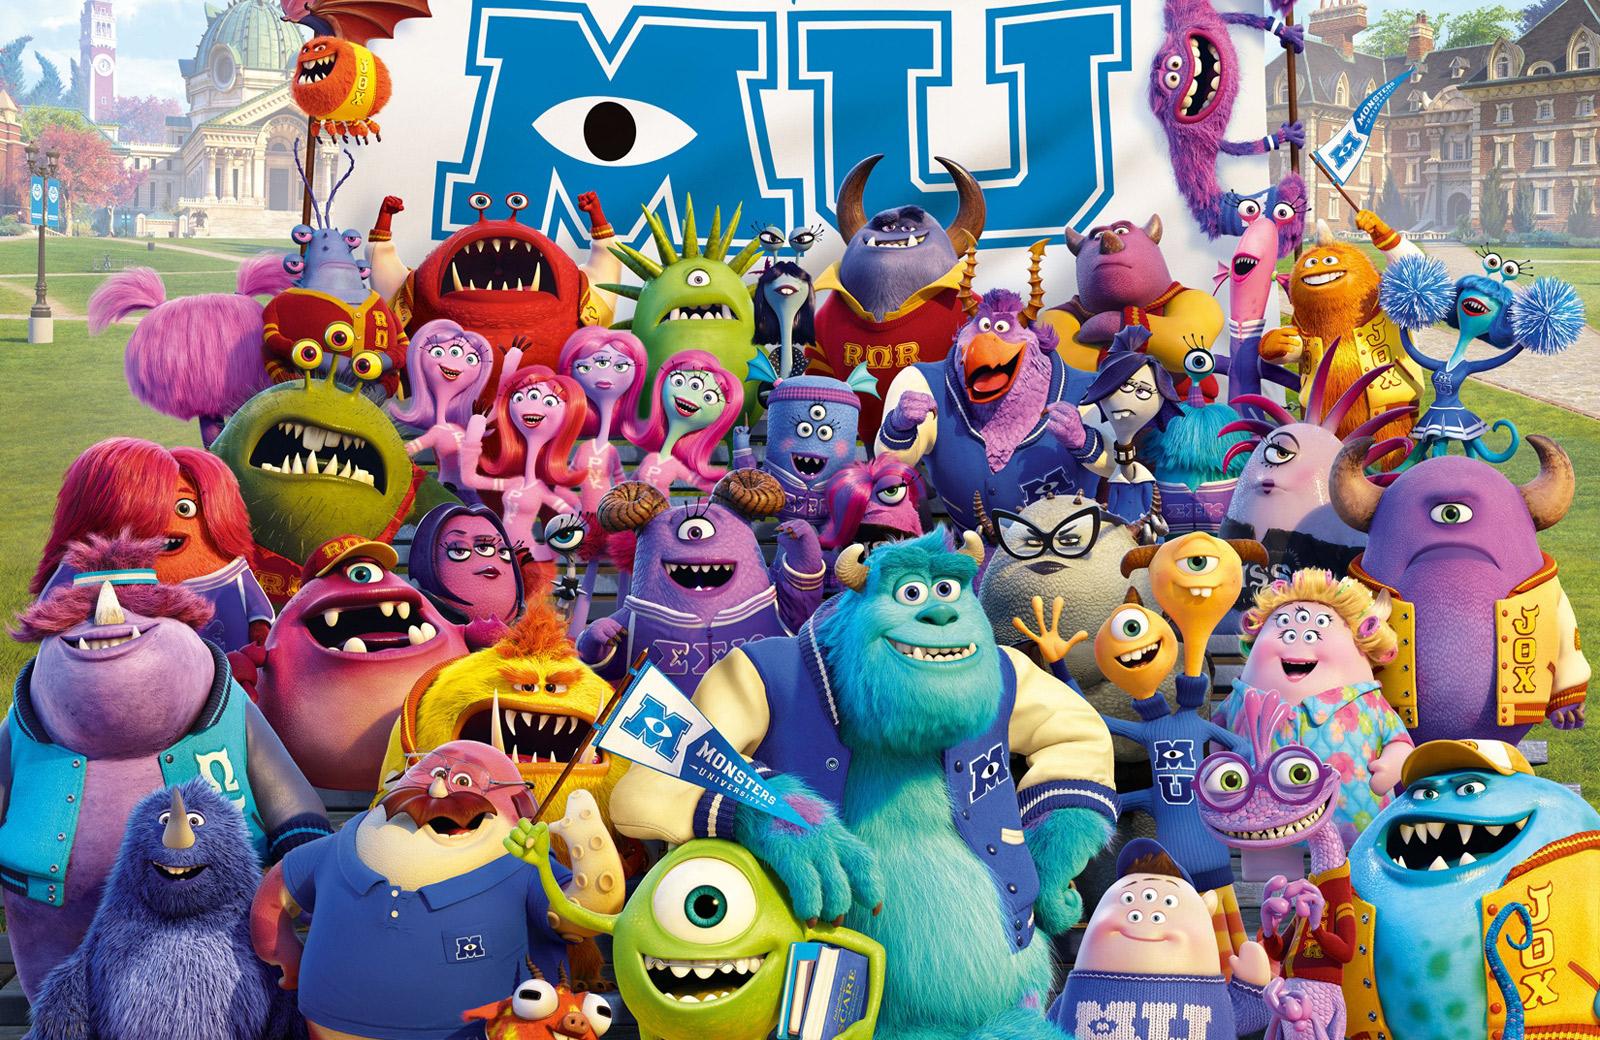 http://planeta-kino.com.ua/f/1/movies/monsters-university/Monsters-University-afisha.jpg